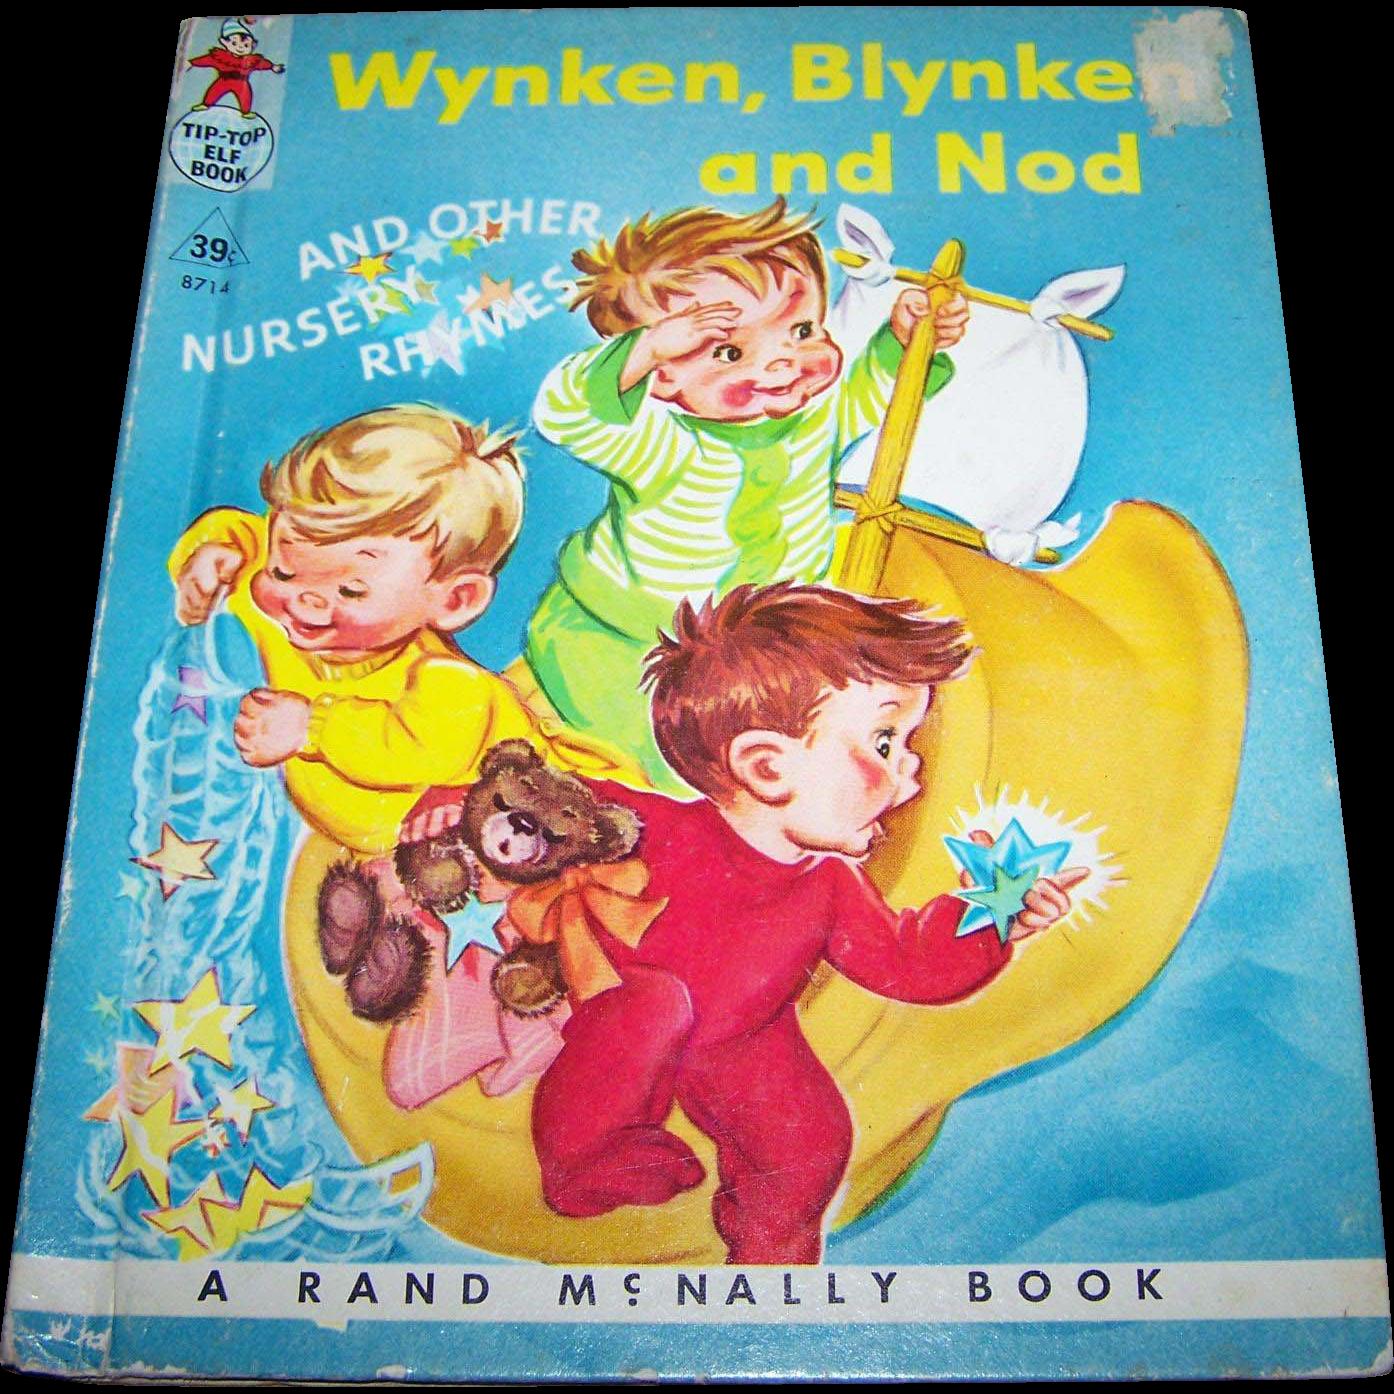 Wynken Blynken and Nod and Other Nursery Rhymes  Vintage Tip Top Elf  Book